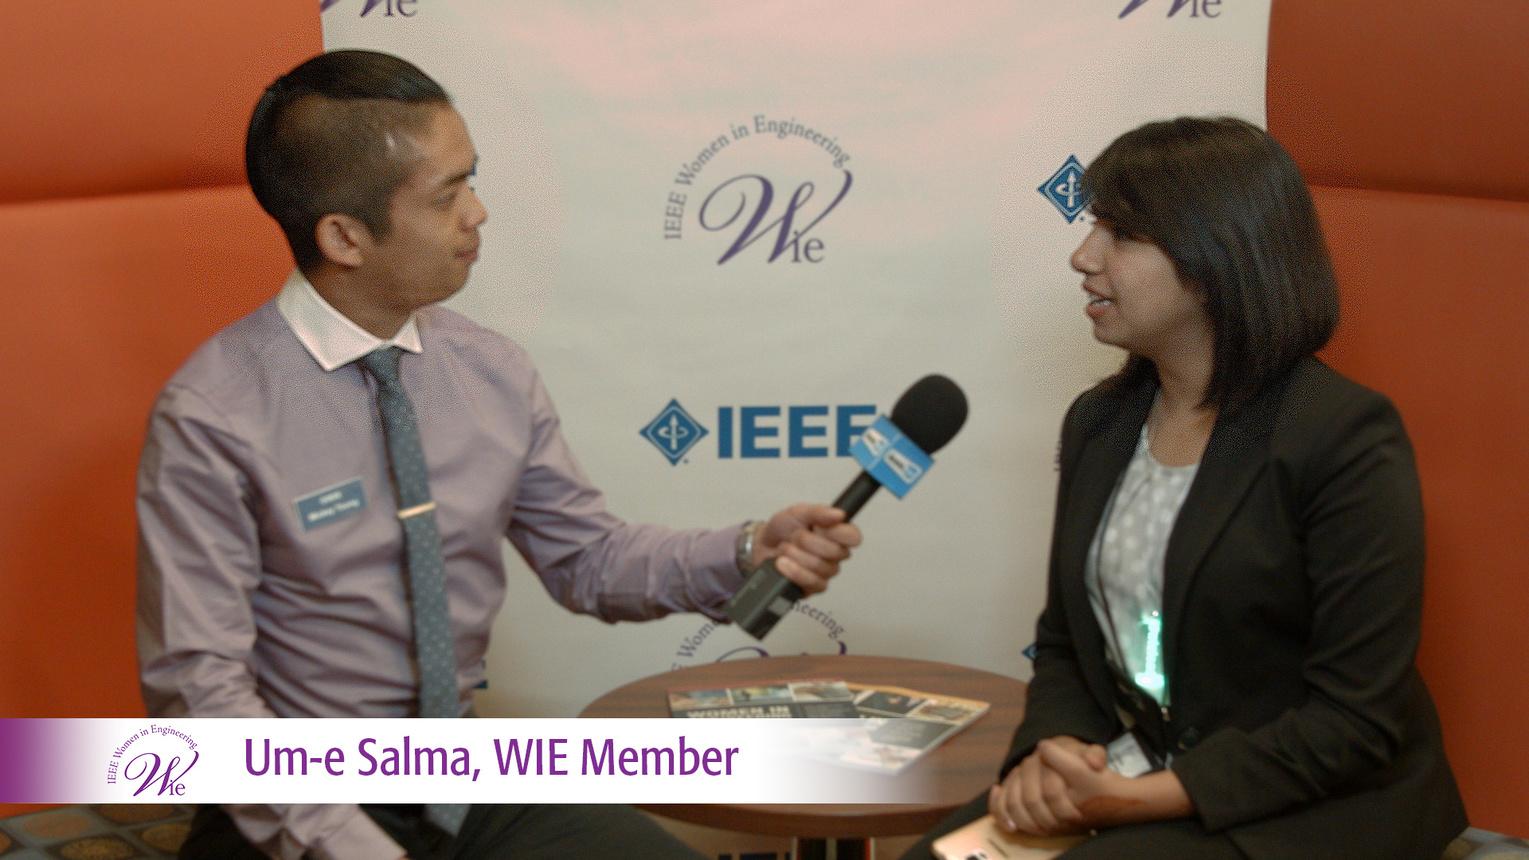 WIE Member Um-e Salma at WIE ILC 2016